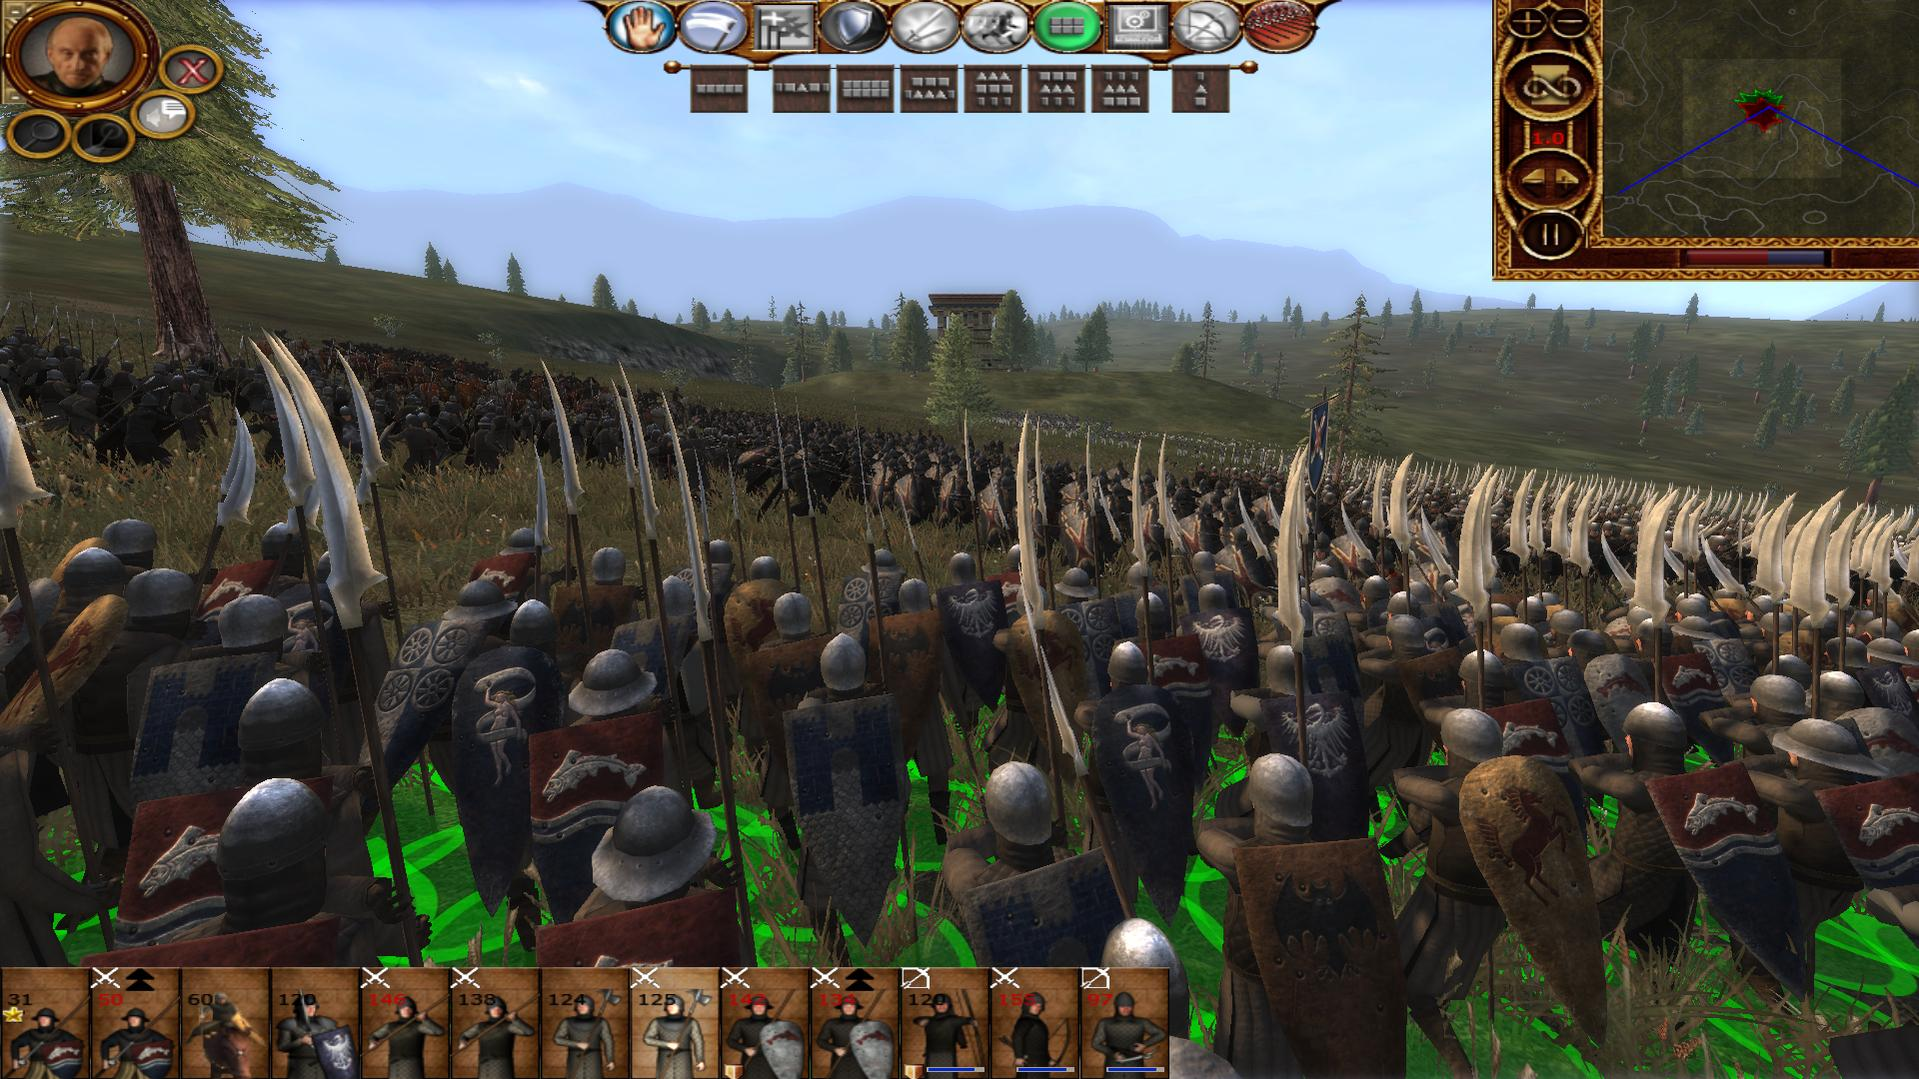 Game of thrones medieval ii total war kingdoms mod